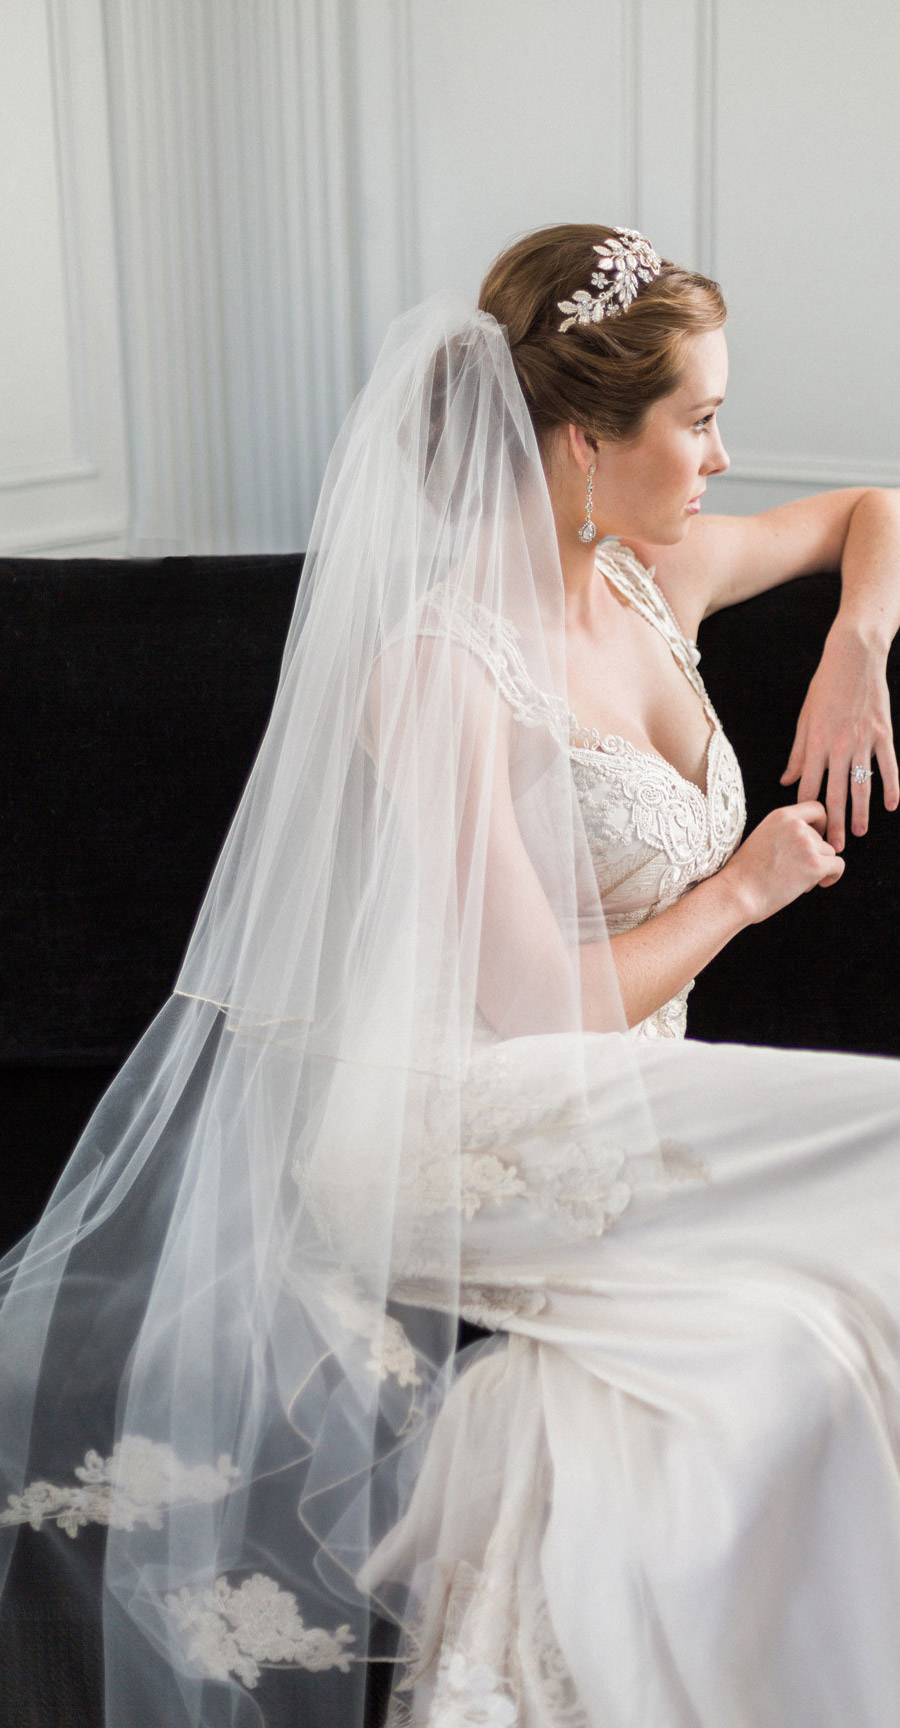 bel aire bridal accessories lace veil headpiece jen fu photography 2016 chloe mint styled wedding shoot culver hotel mv